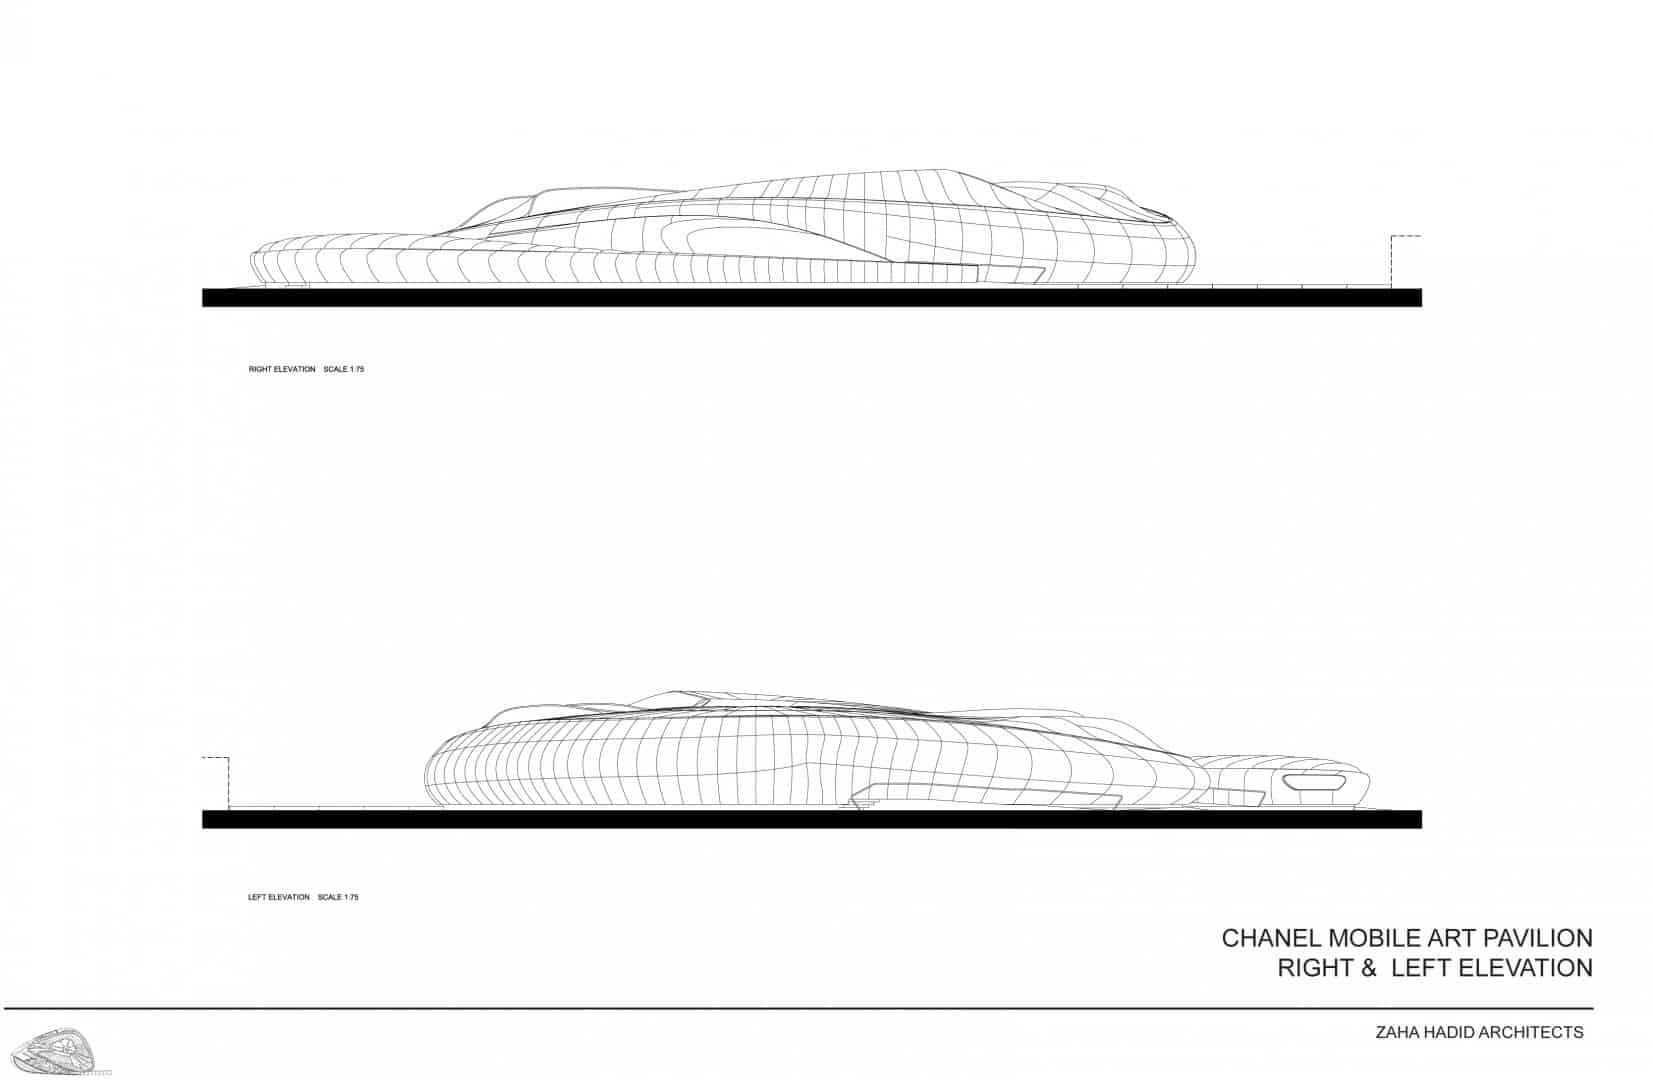 Zaha Hadid Design - Mobile Art Chanel Pavilion - drawings4